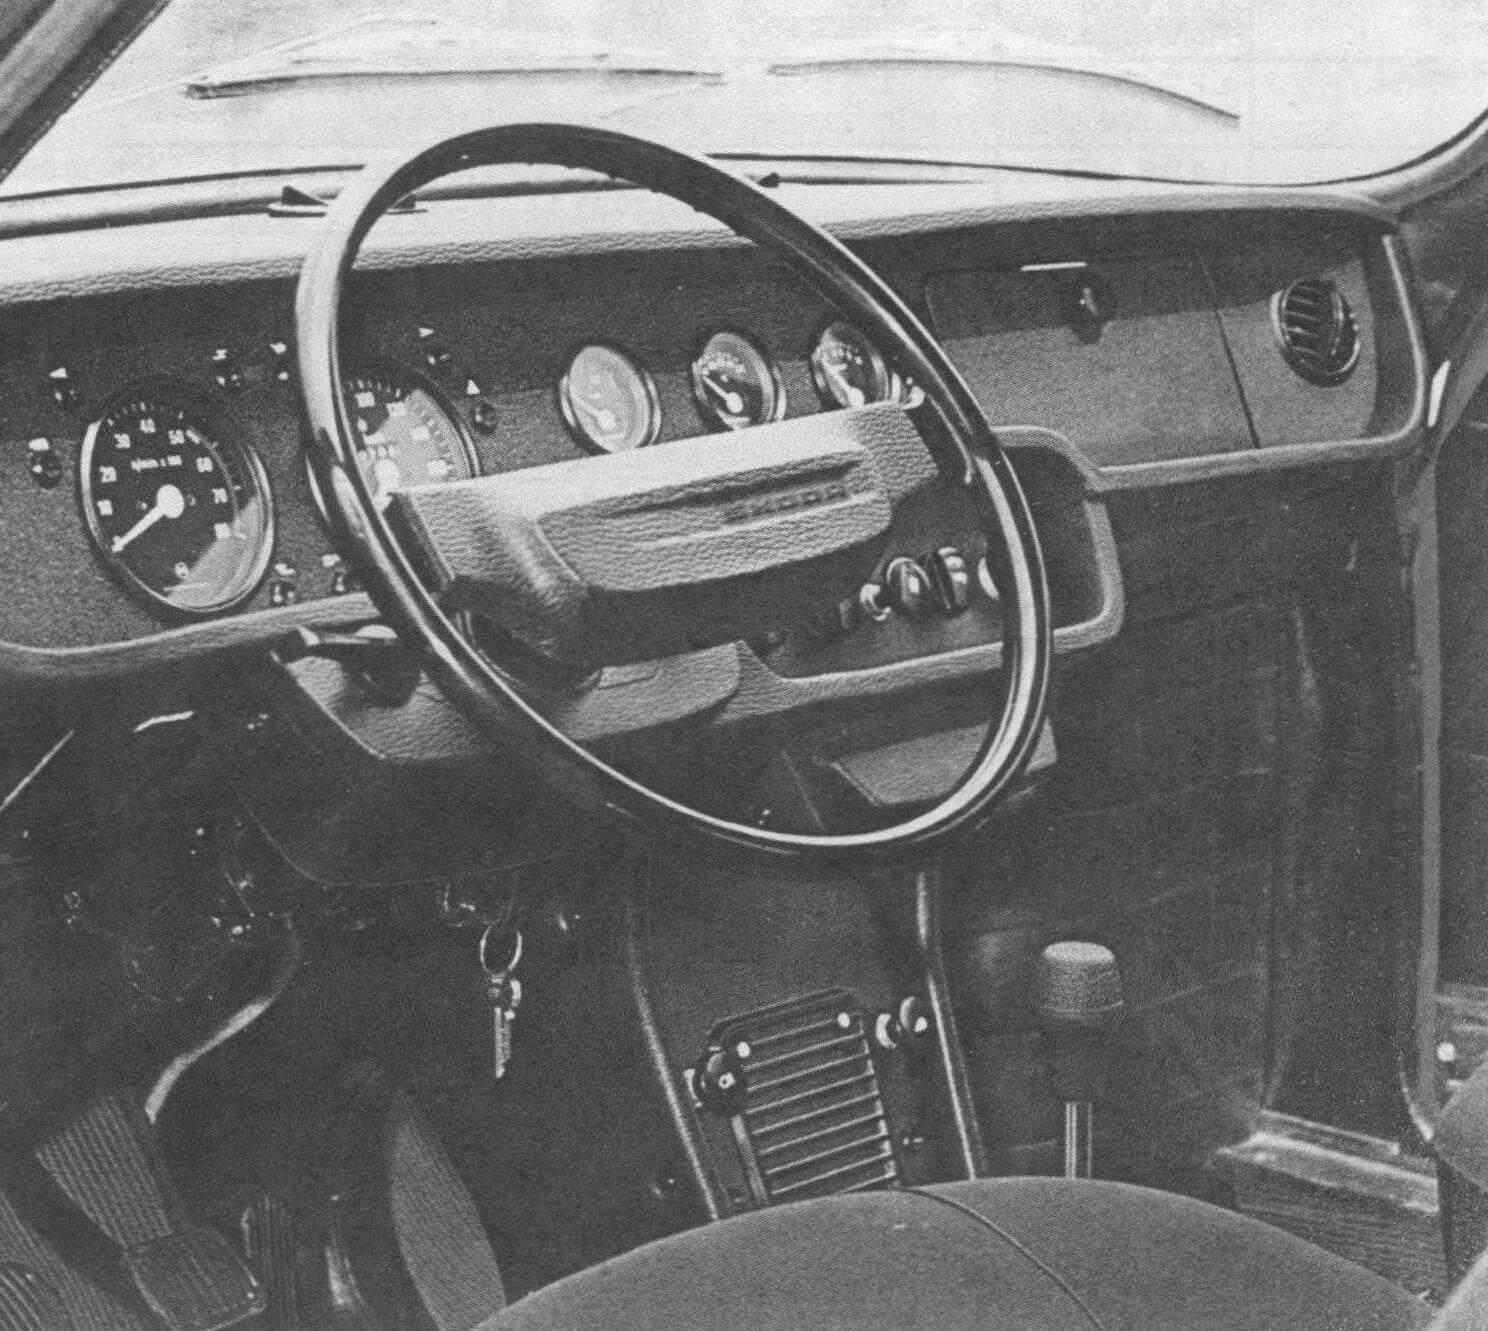 Салон Skoda 110R выпуска 1974 года